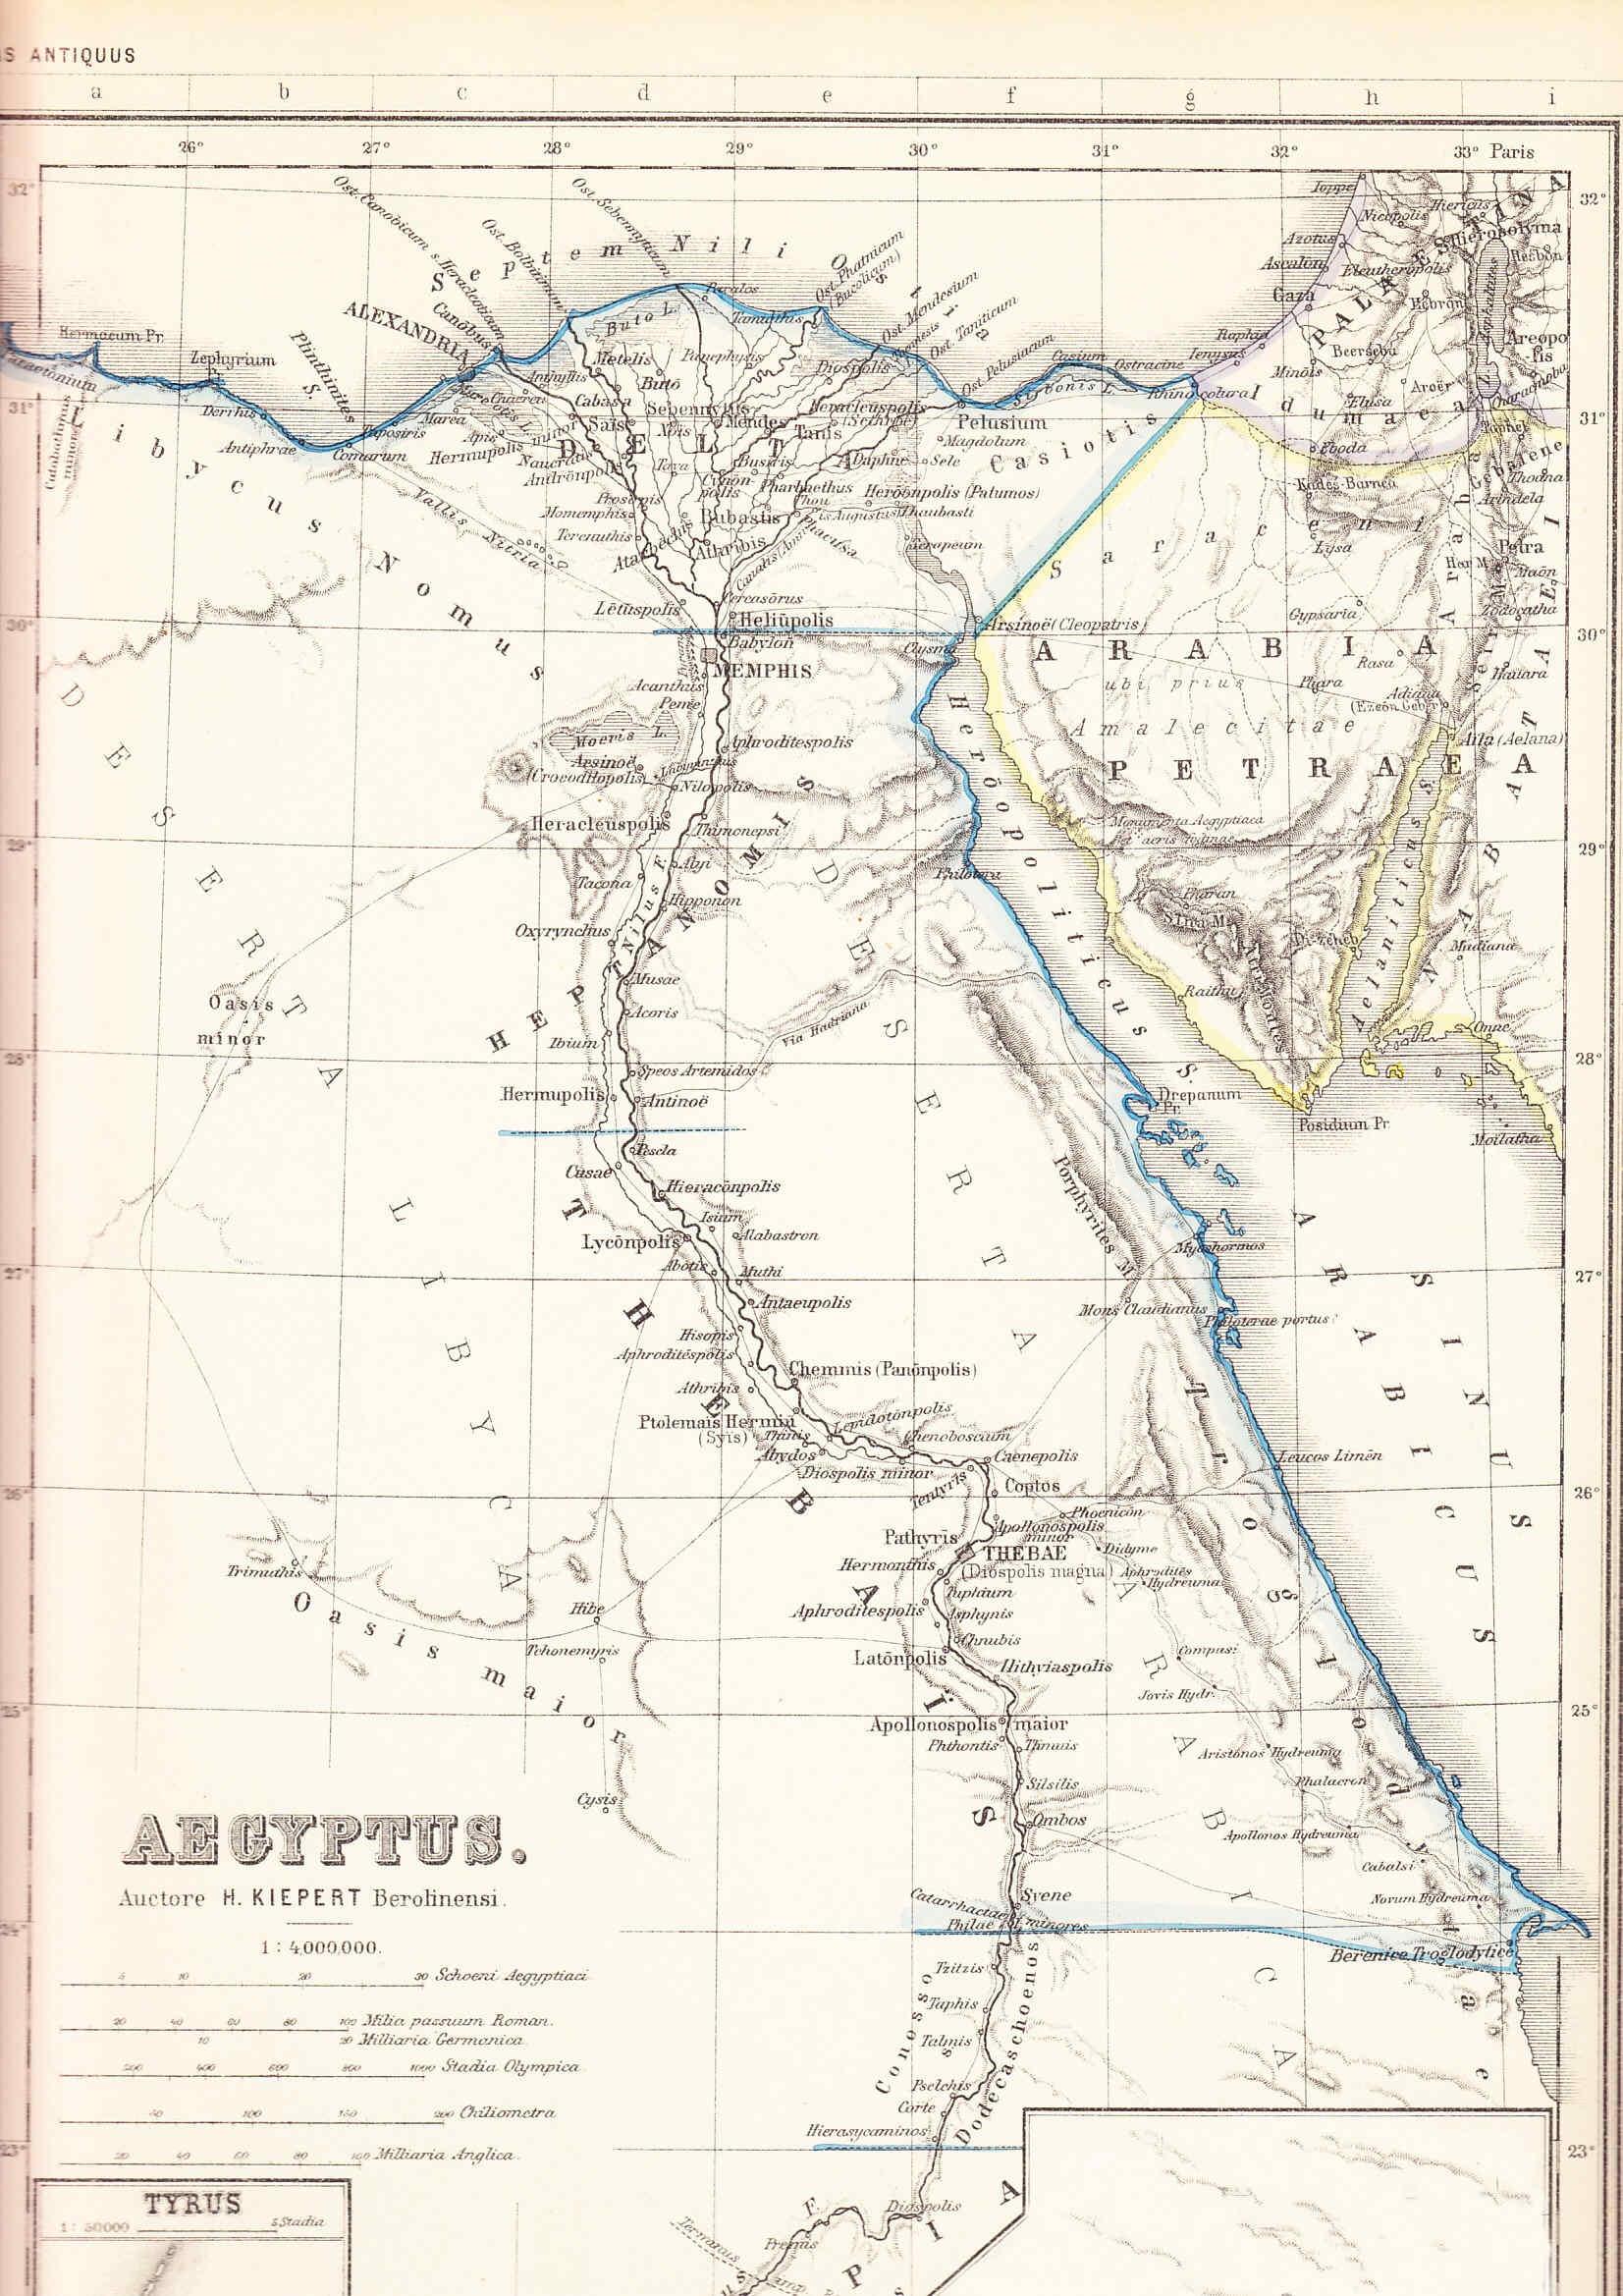 Egipto antiguo 13 y Arsínoe II 2